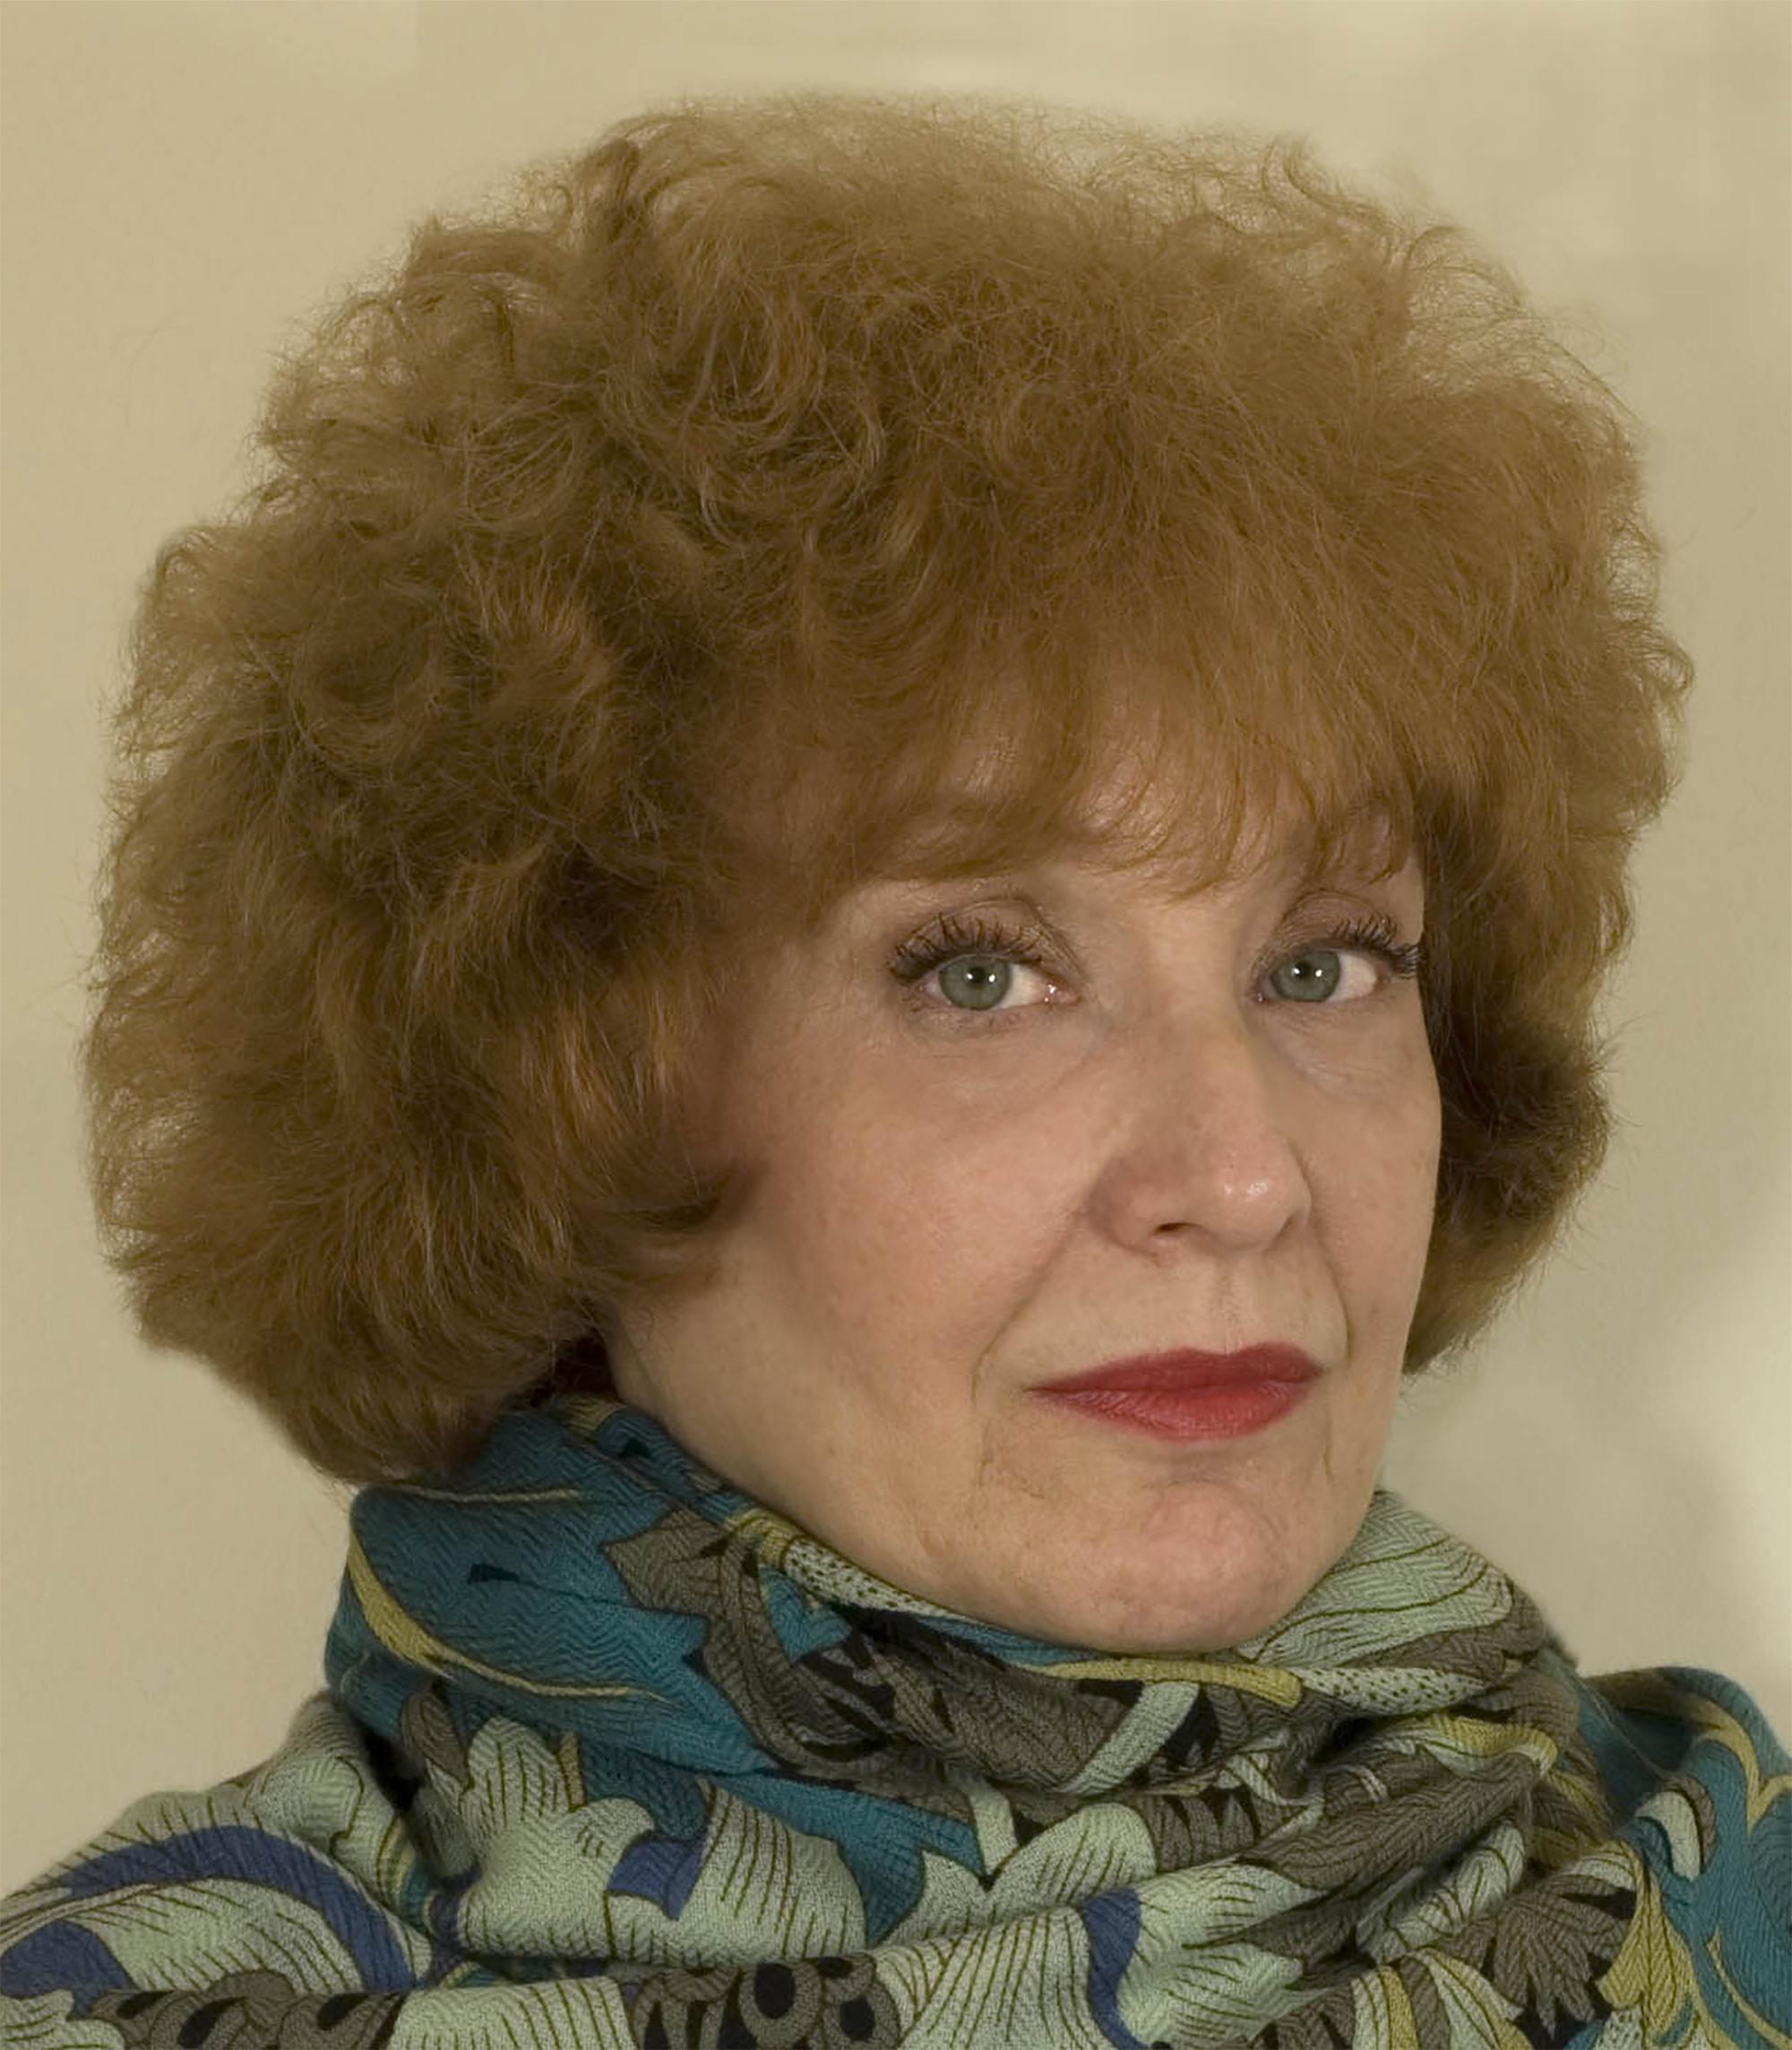 Evelyn Cohen